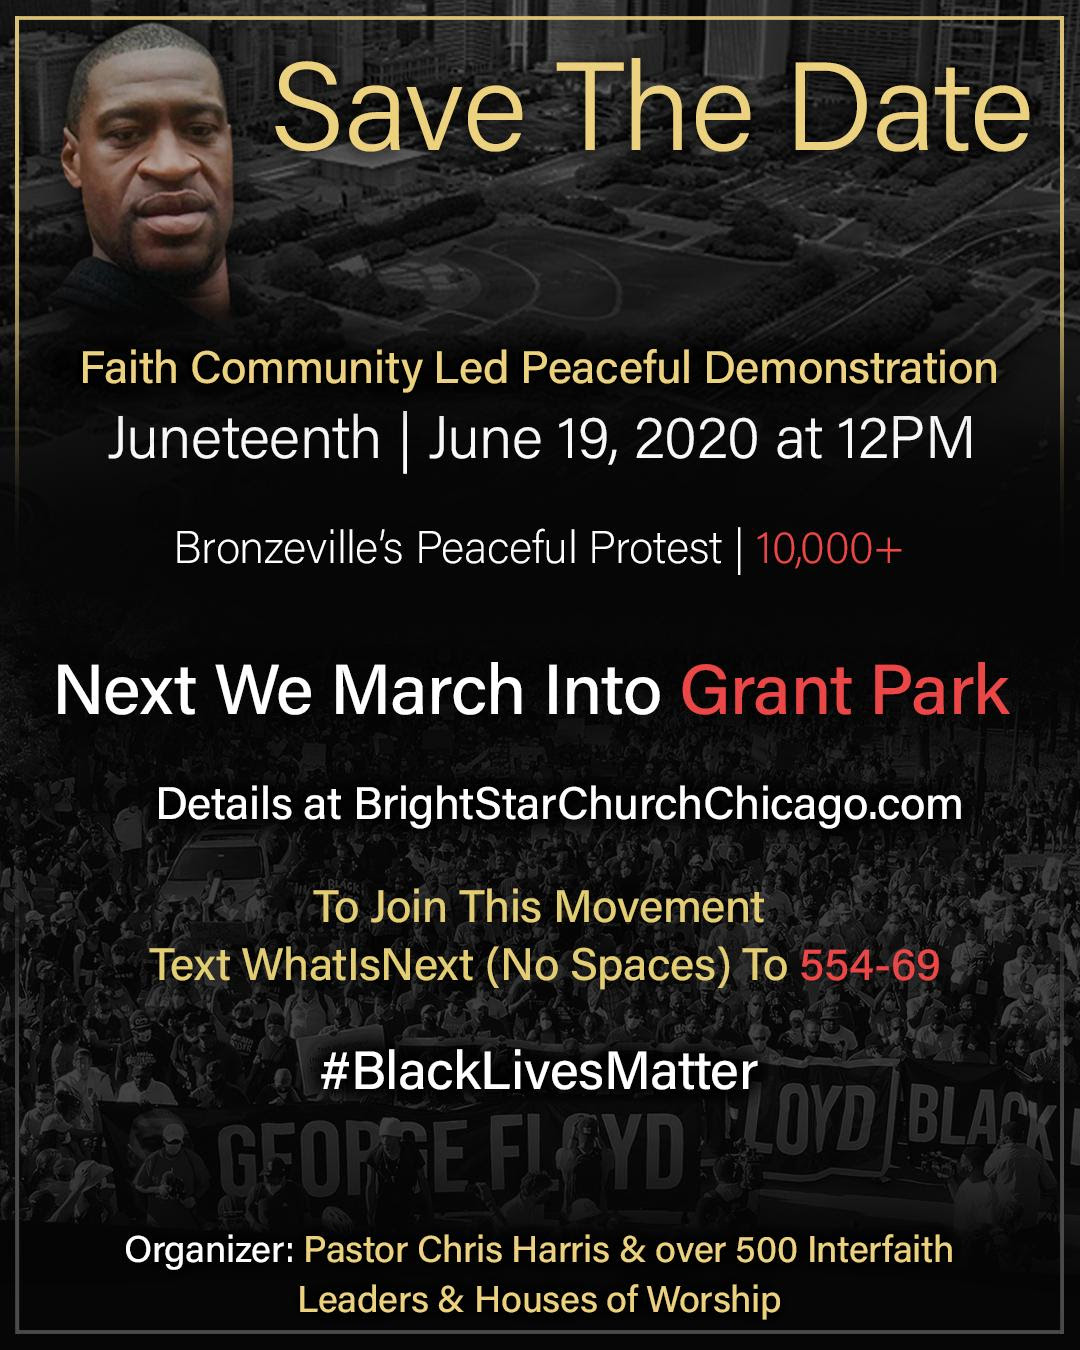 Faith Community Led Peaceful Demonstration